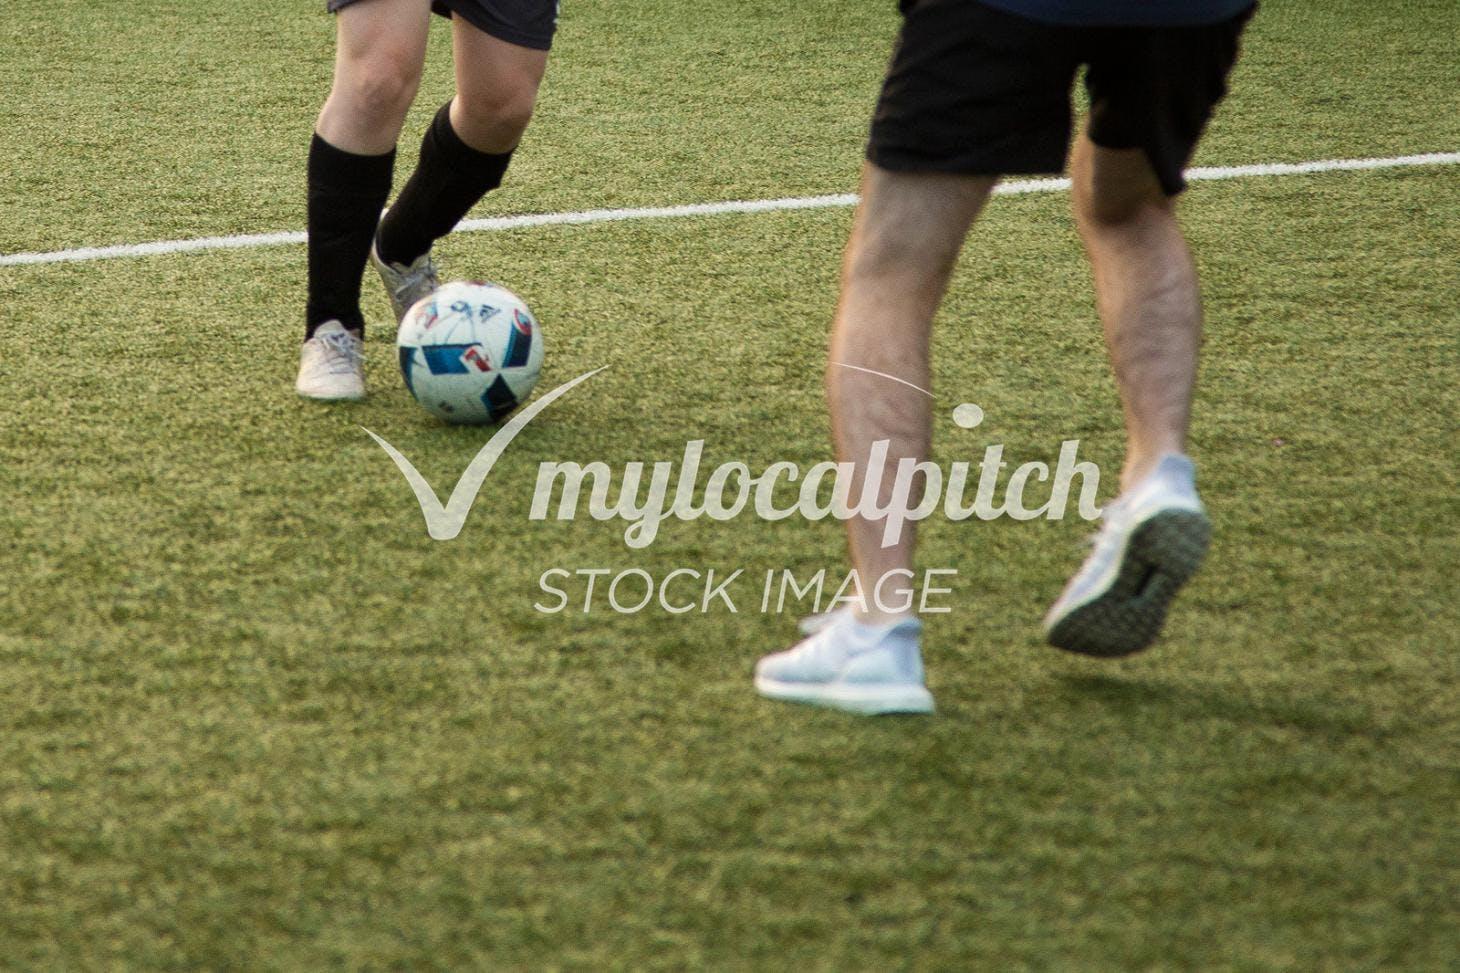 South Croydon Recreation Ground 11 a side | Grass football pitch